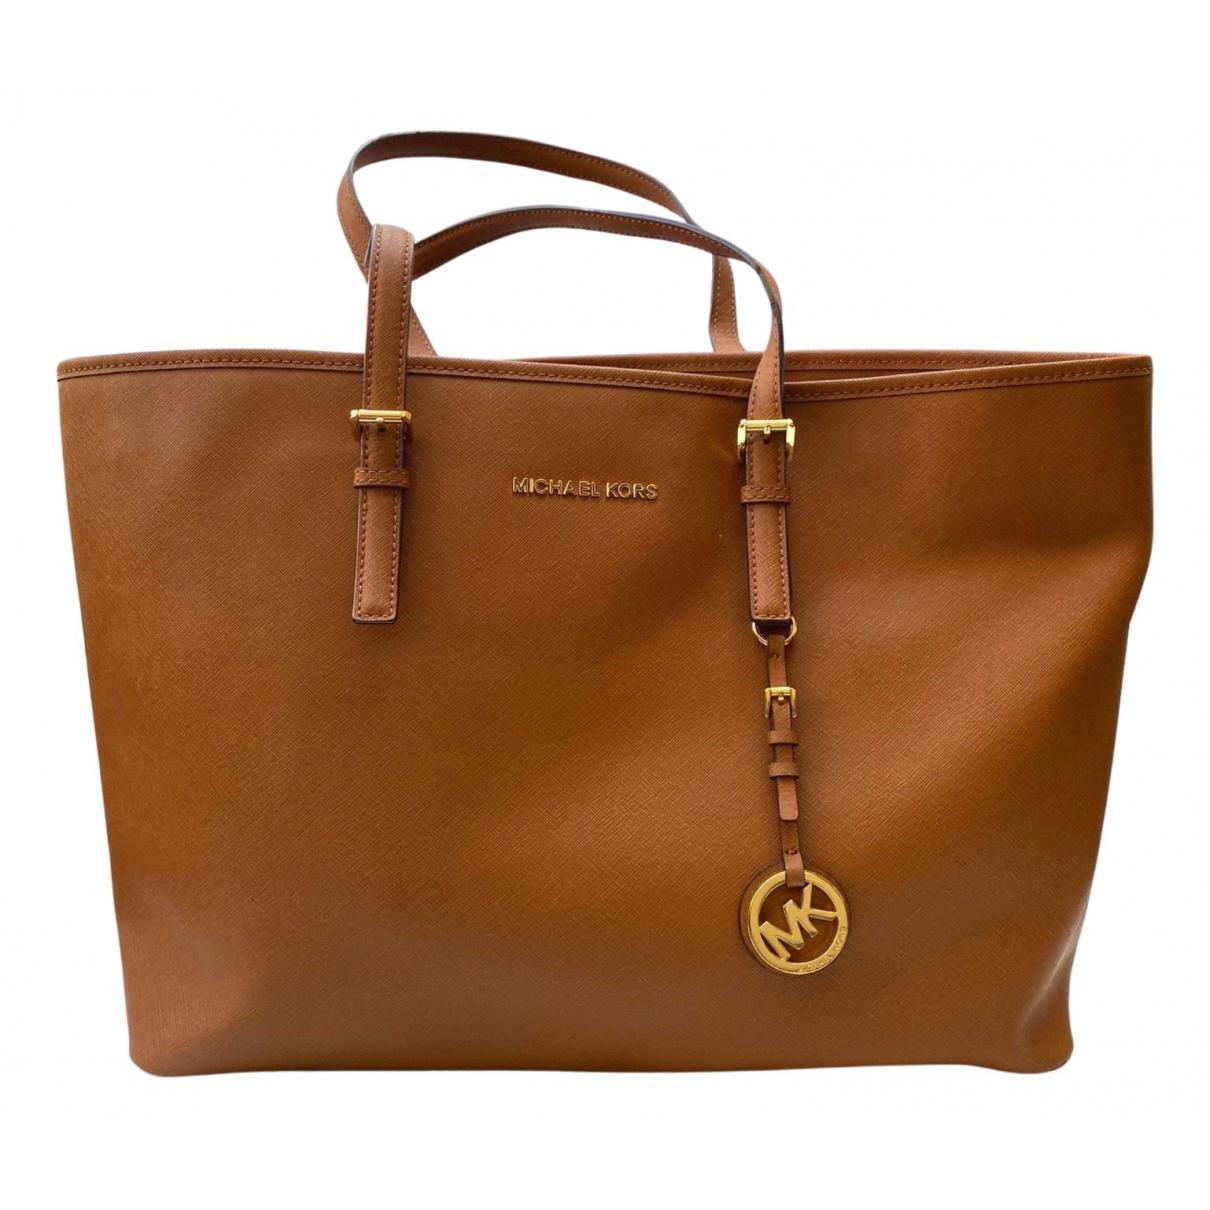 Michael Kors N Brown Leather handbag for Women N